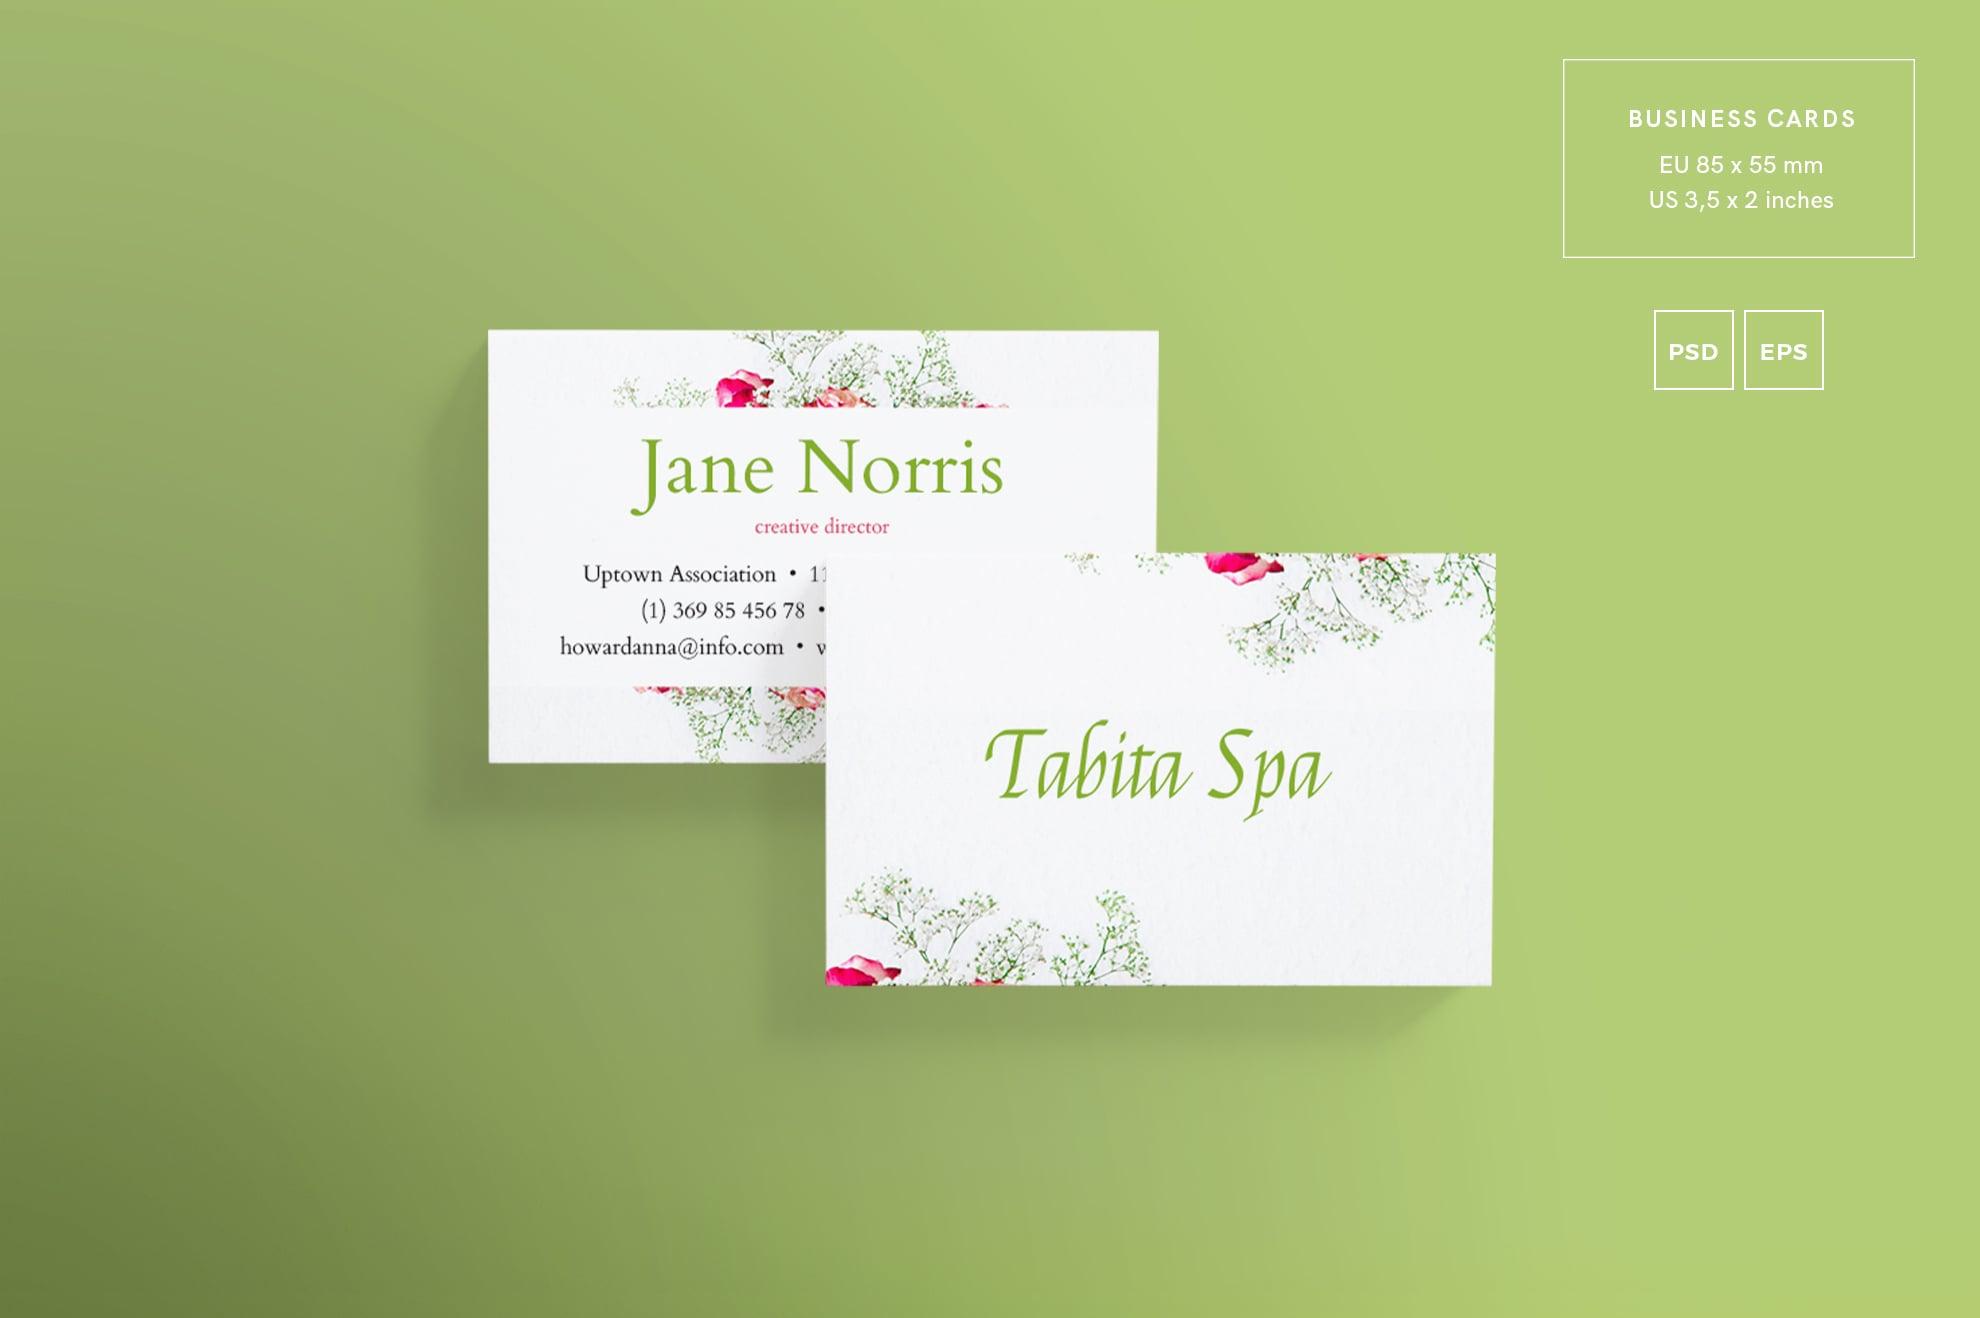 110 in 1 Business Card Bundle - 003 bc tabita spa 29 1